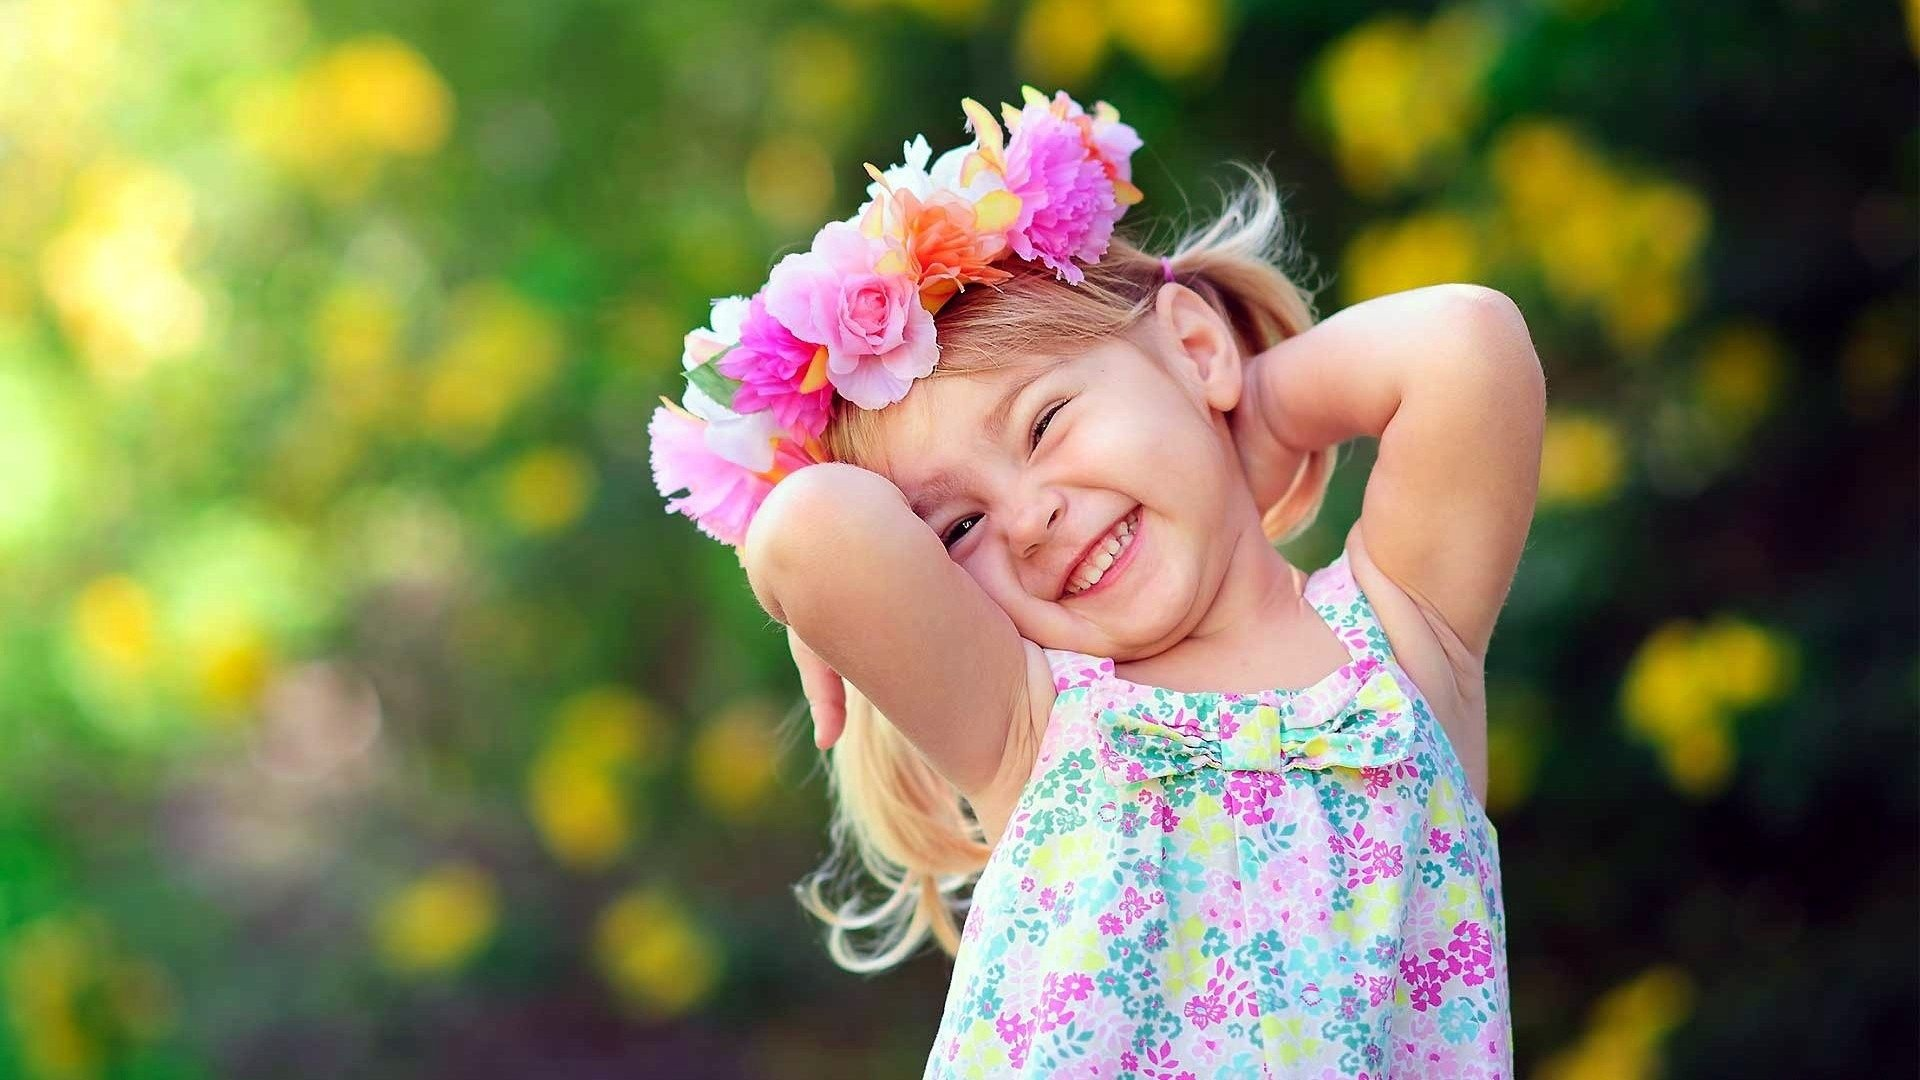 Beautiful Small Girl Image Download